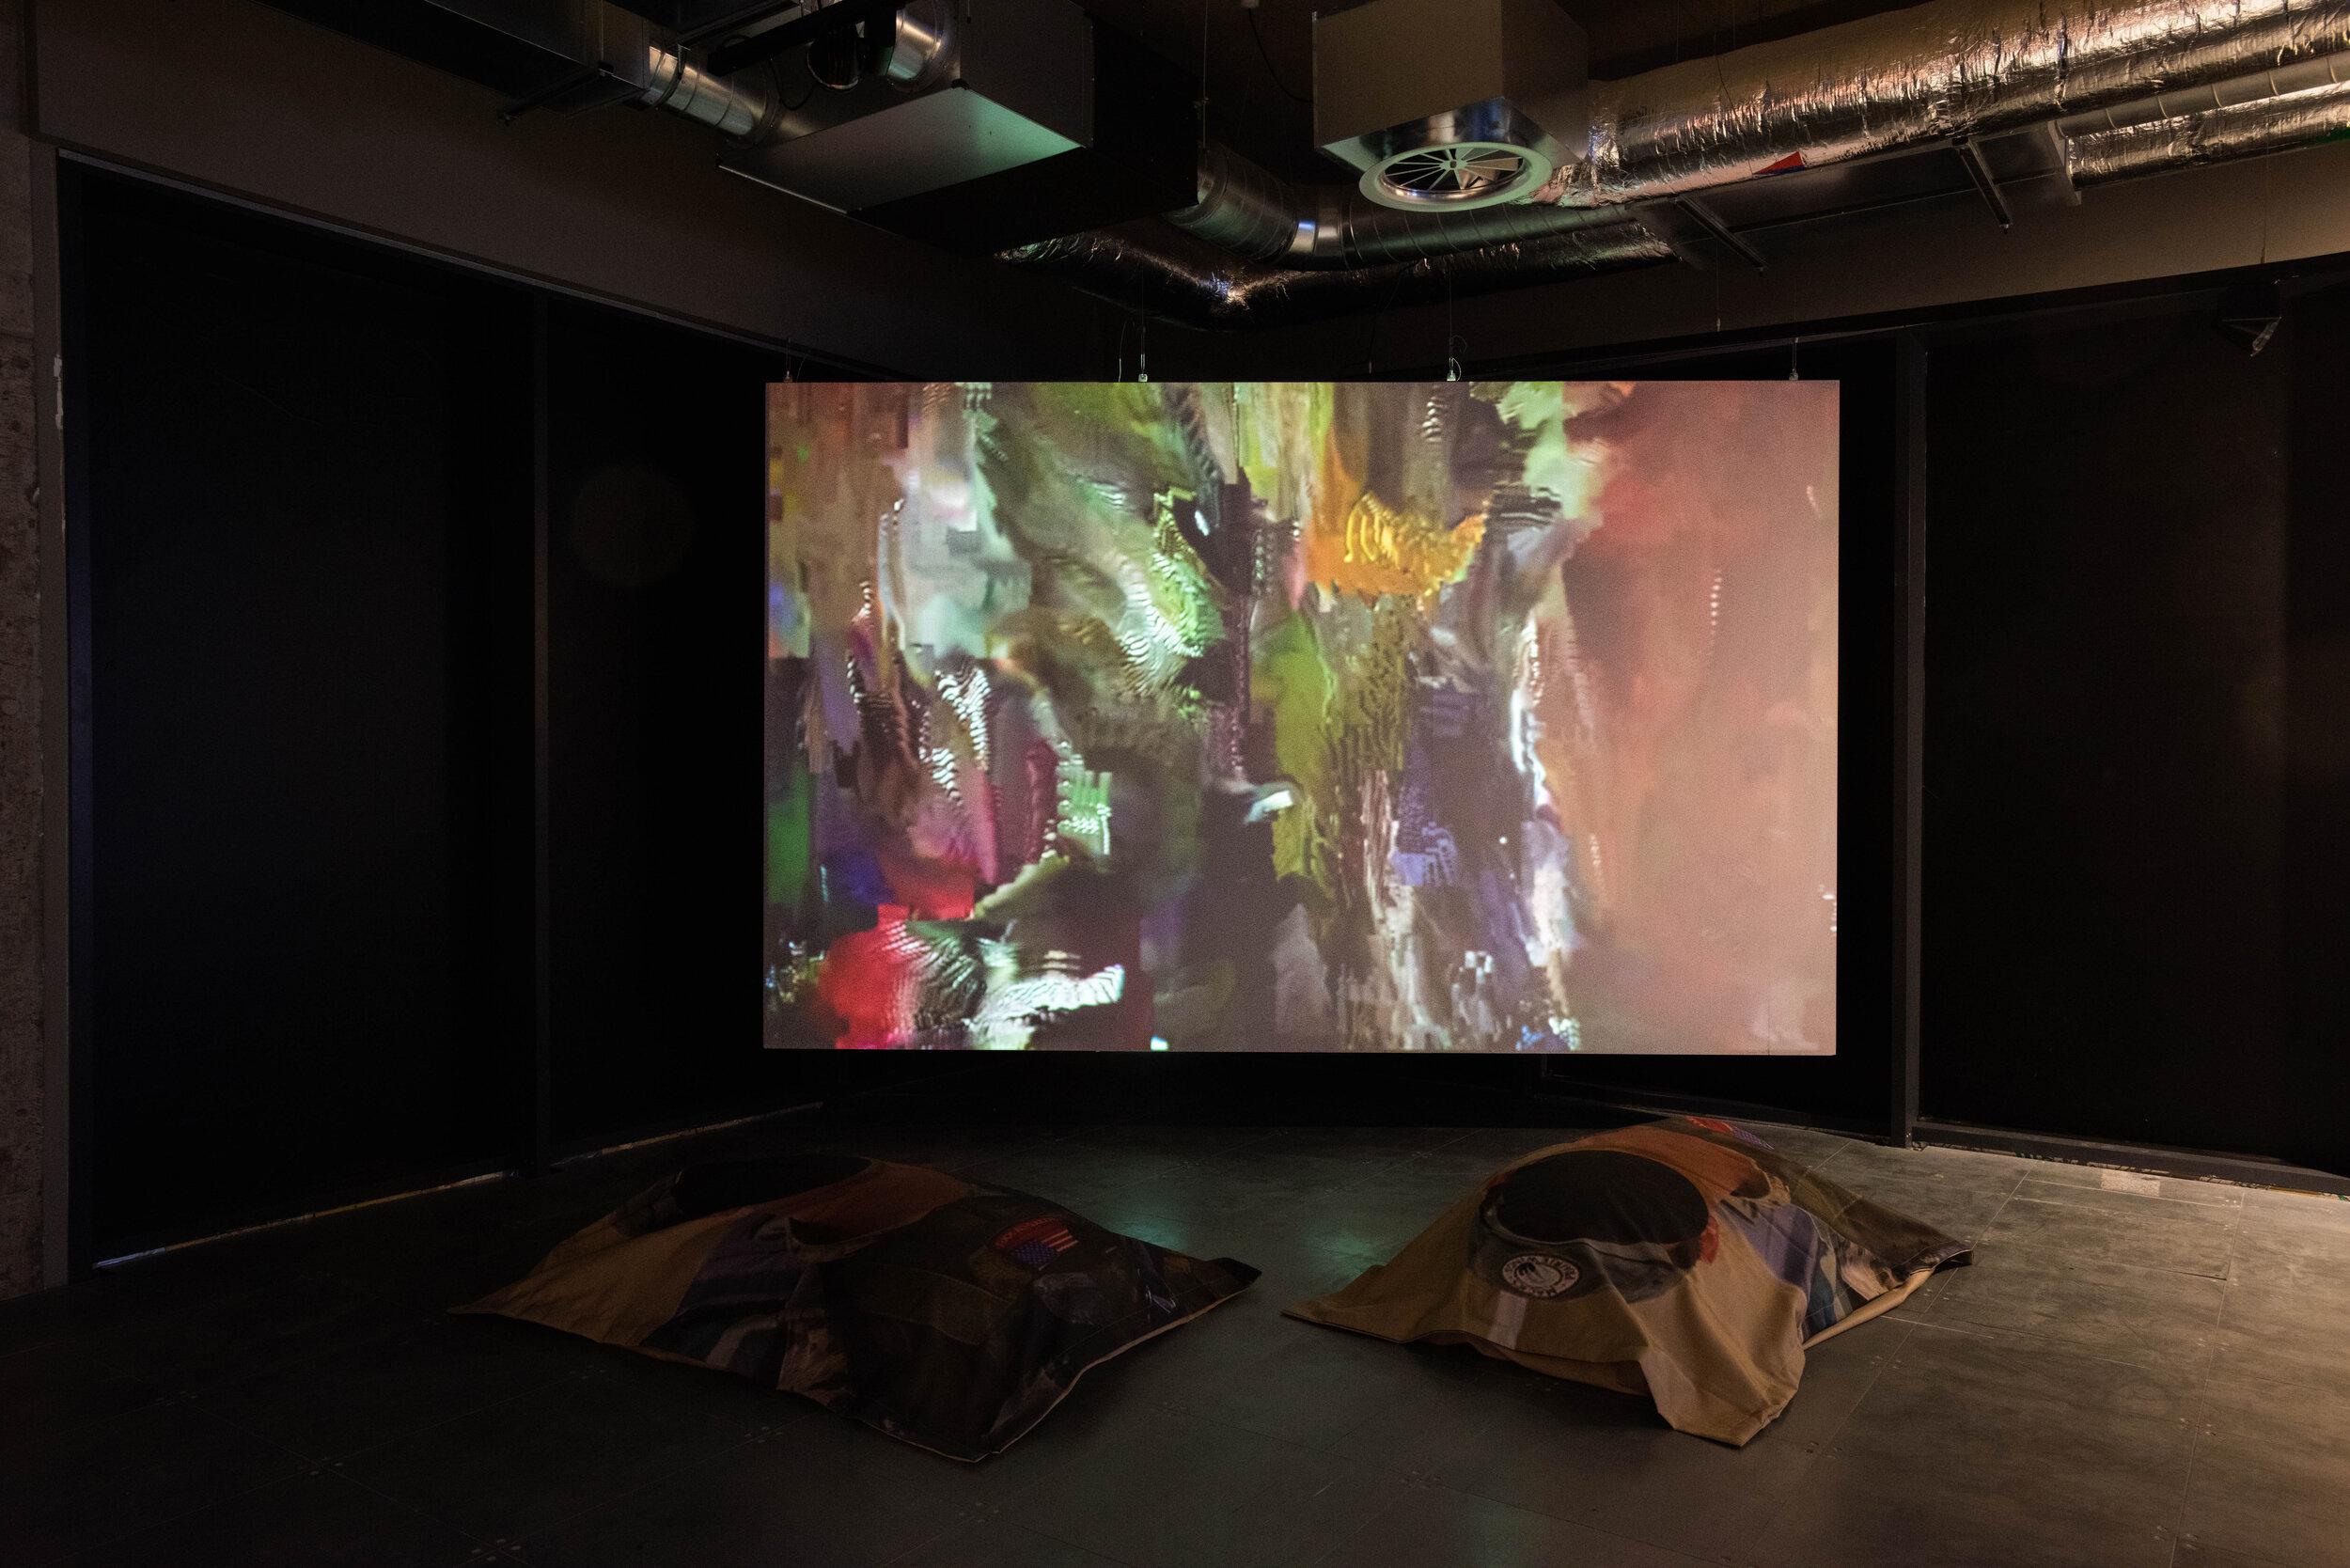 Installation view: 'Powerplay'. Image via vincentbezuidenhout.com.